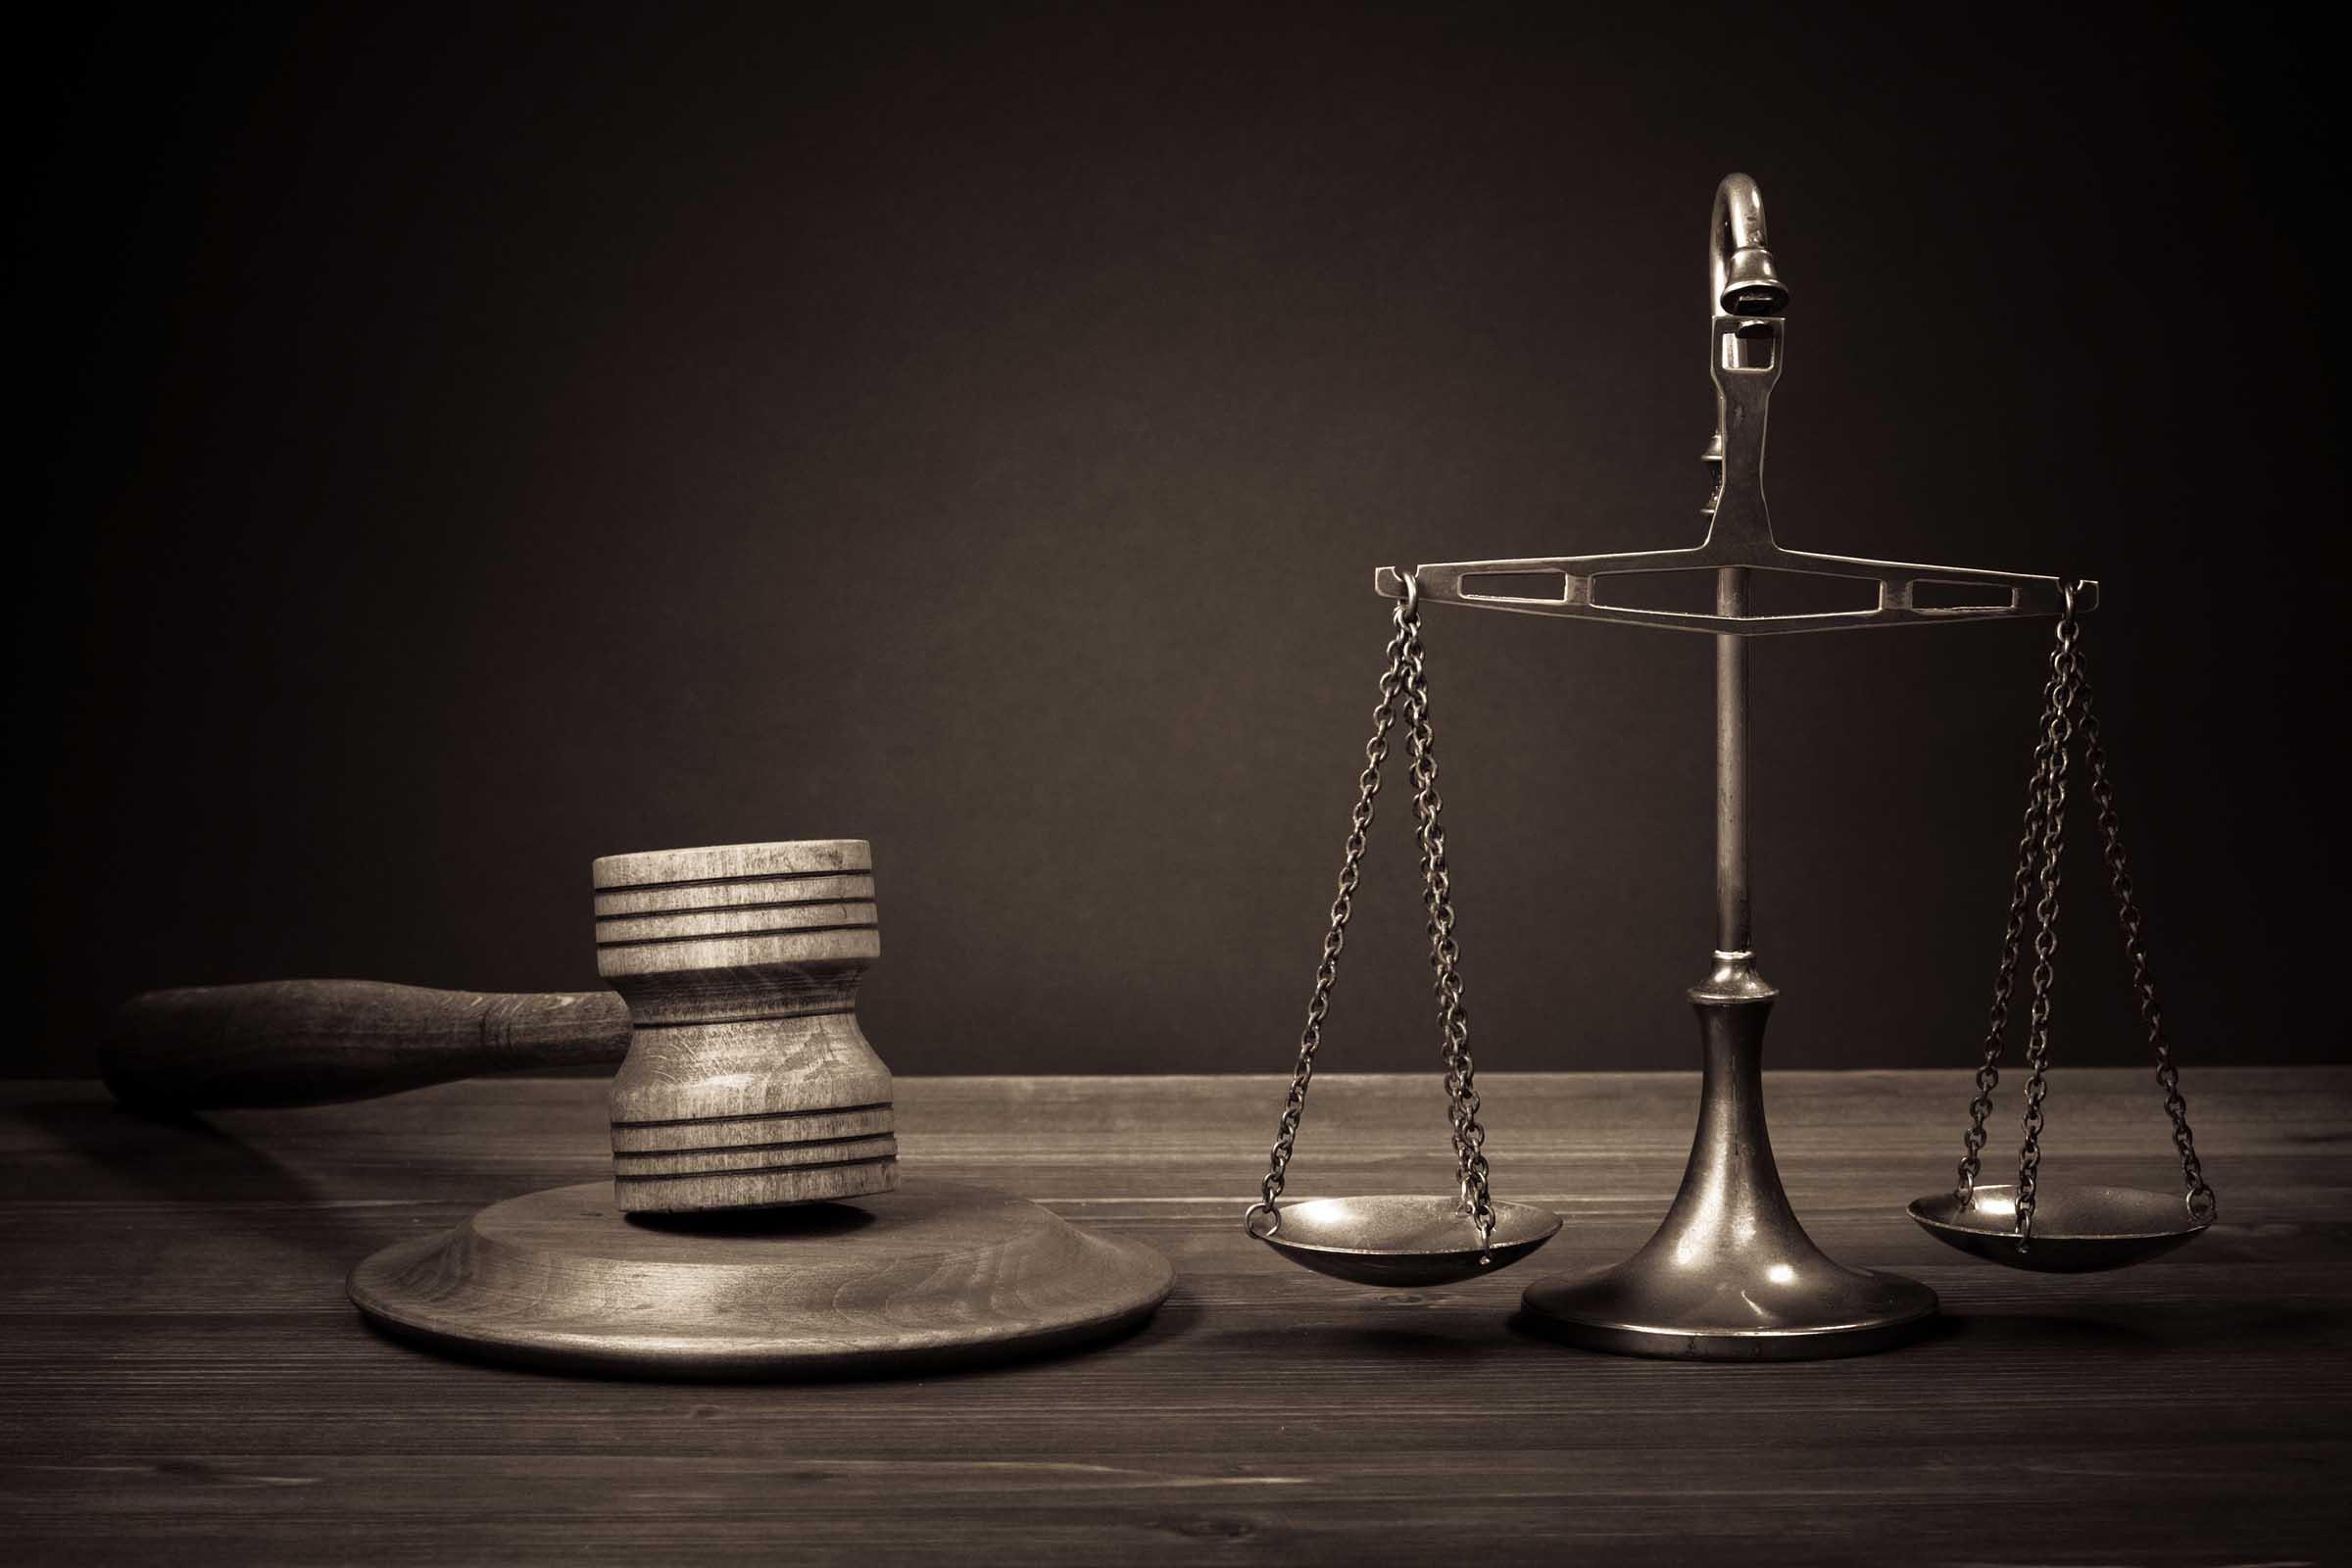 Justiça - Estudos Bíblicos